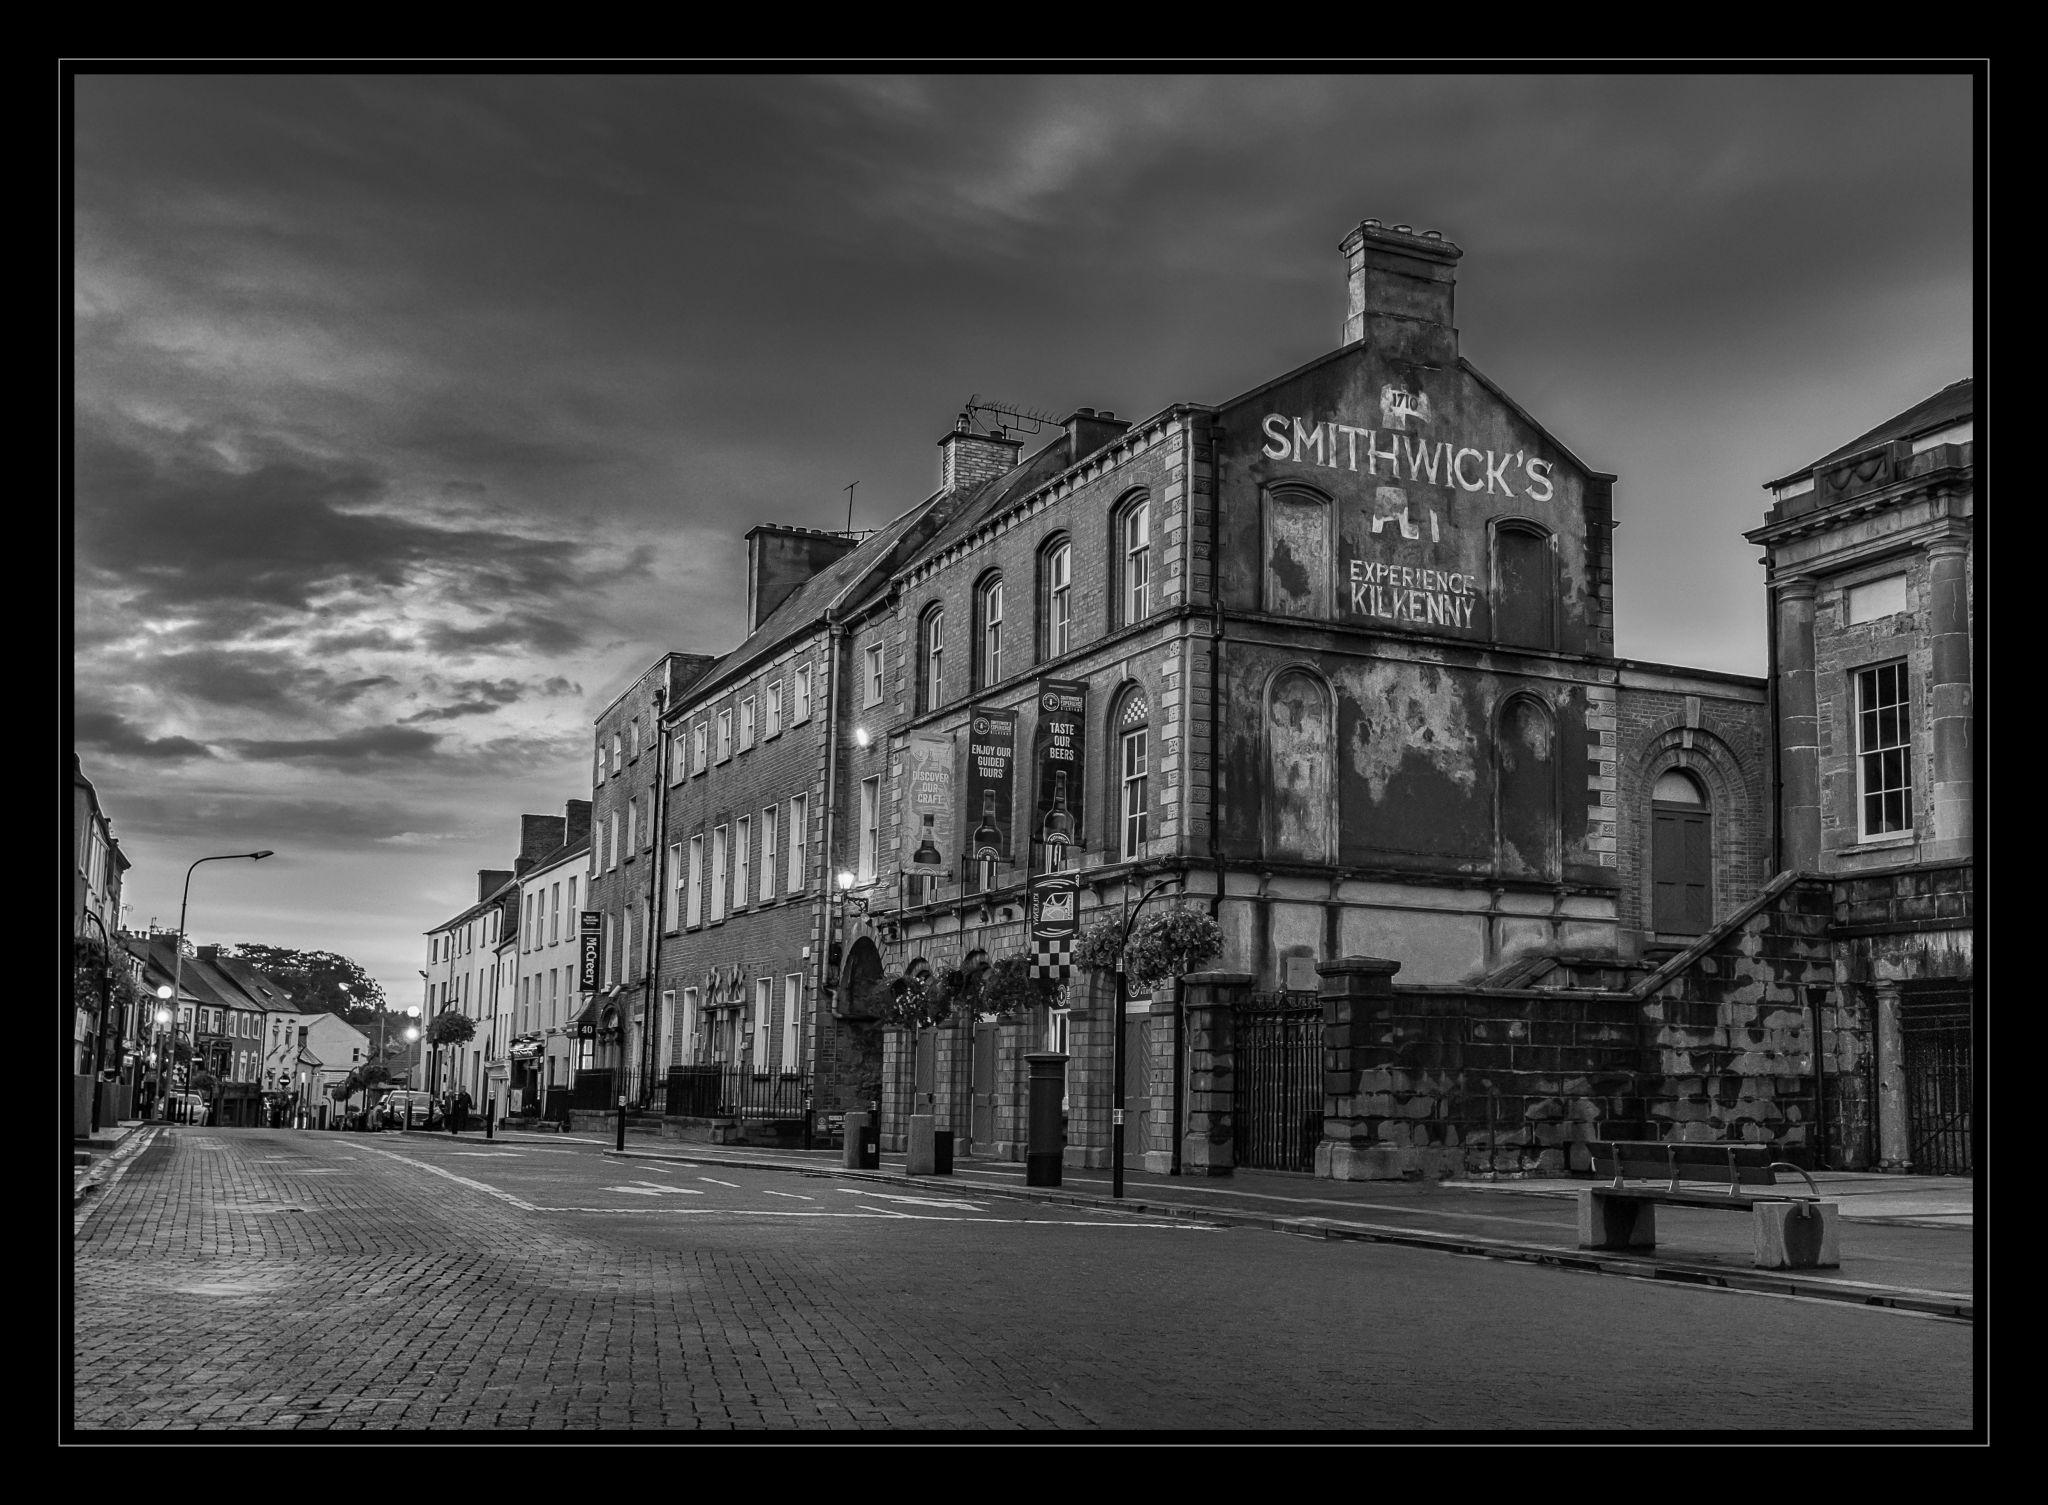 The Smithwick's Experience Kilkenny, Ireland